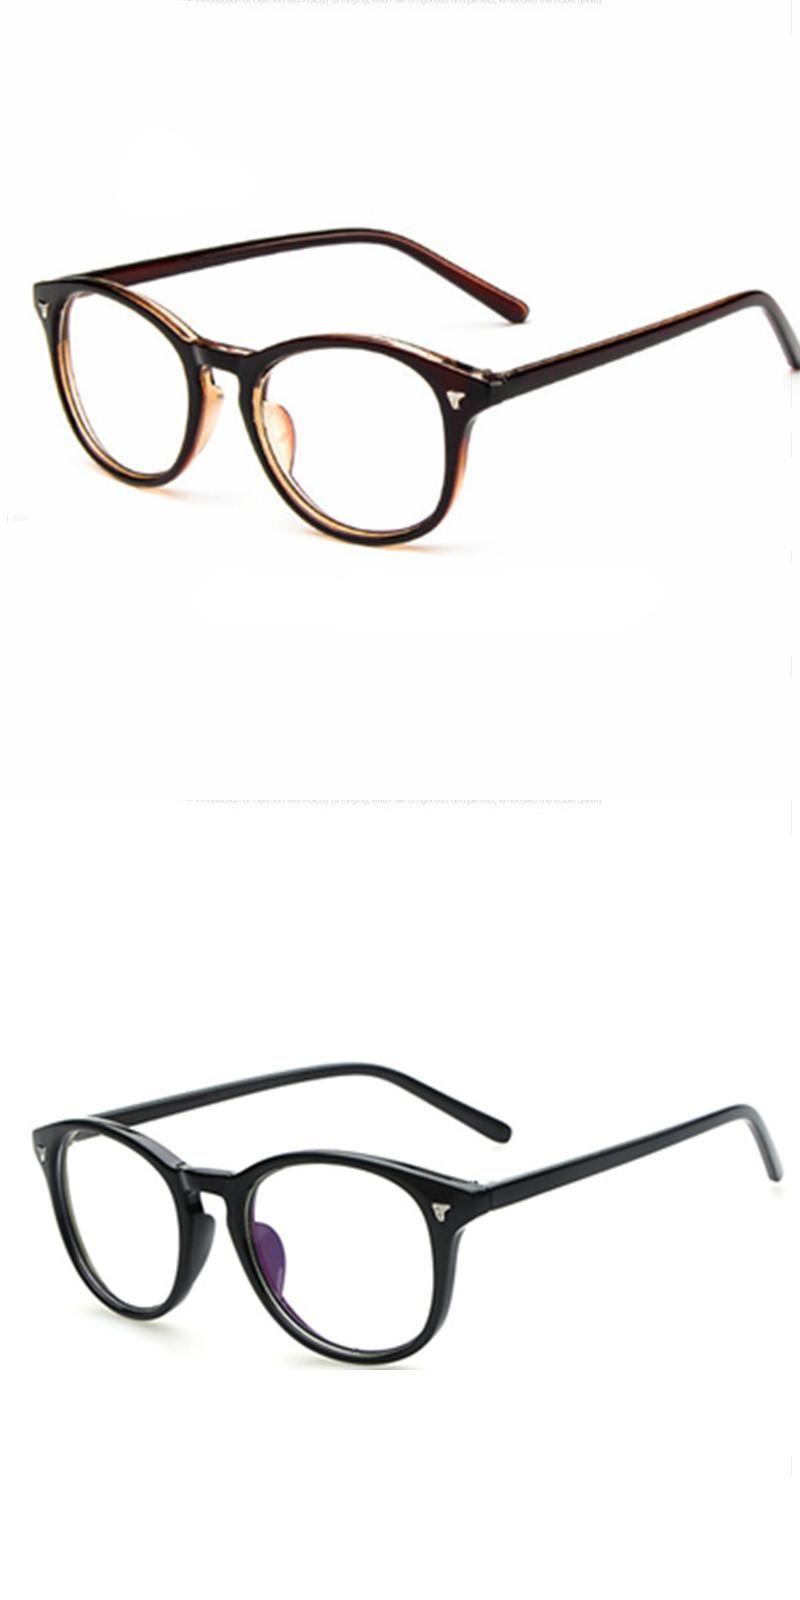 2017 Famous Brand Oliver Peoples Square Vintage Myopia Glasses Frame ...